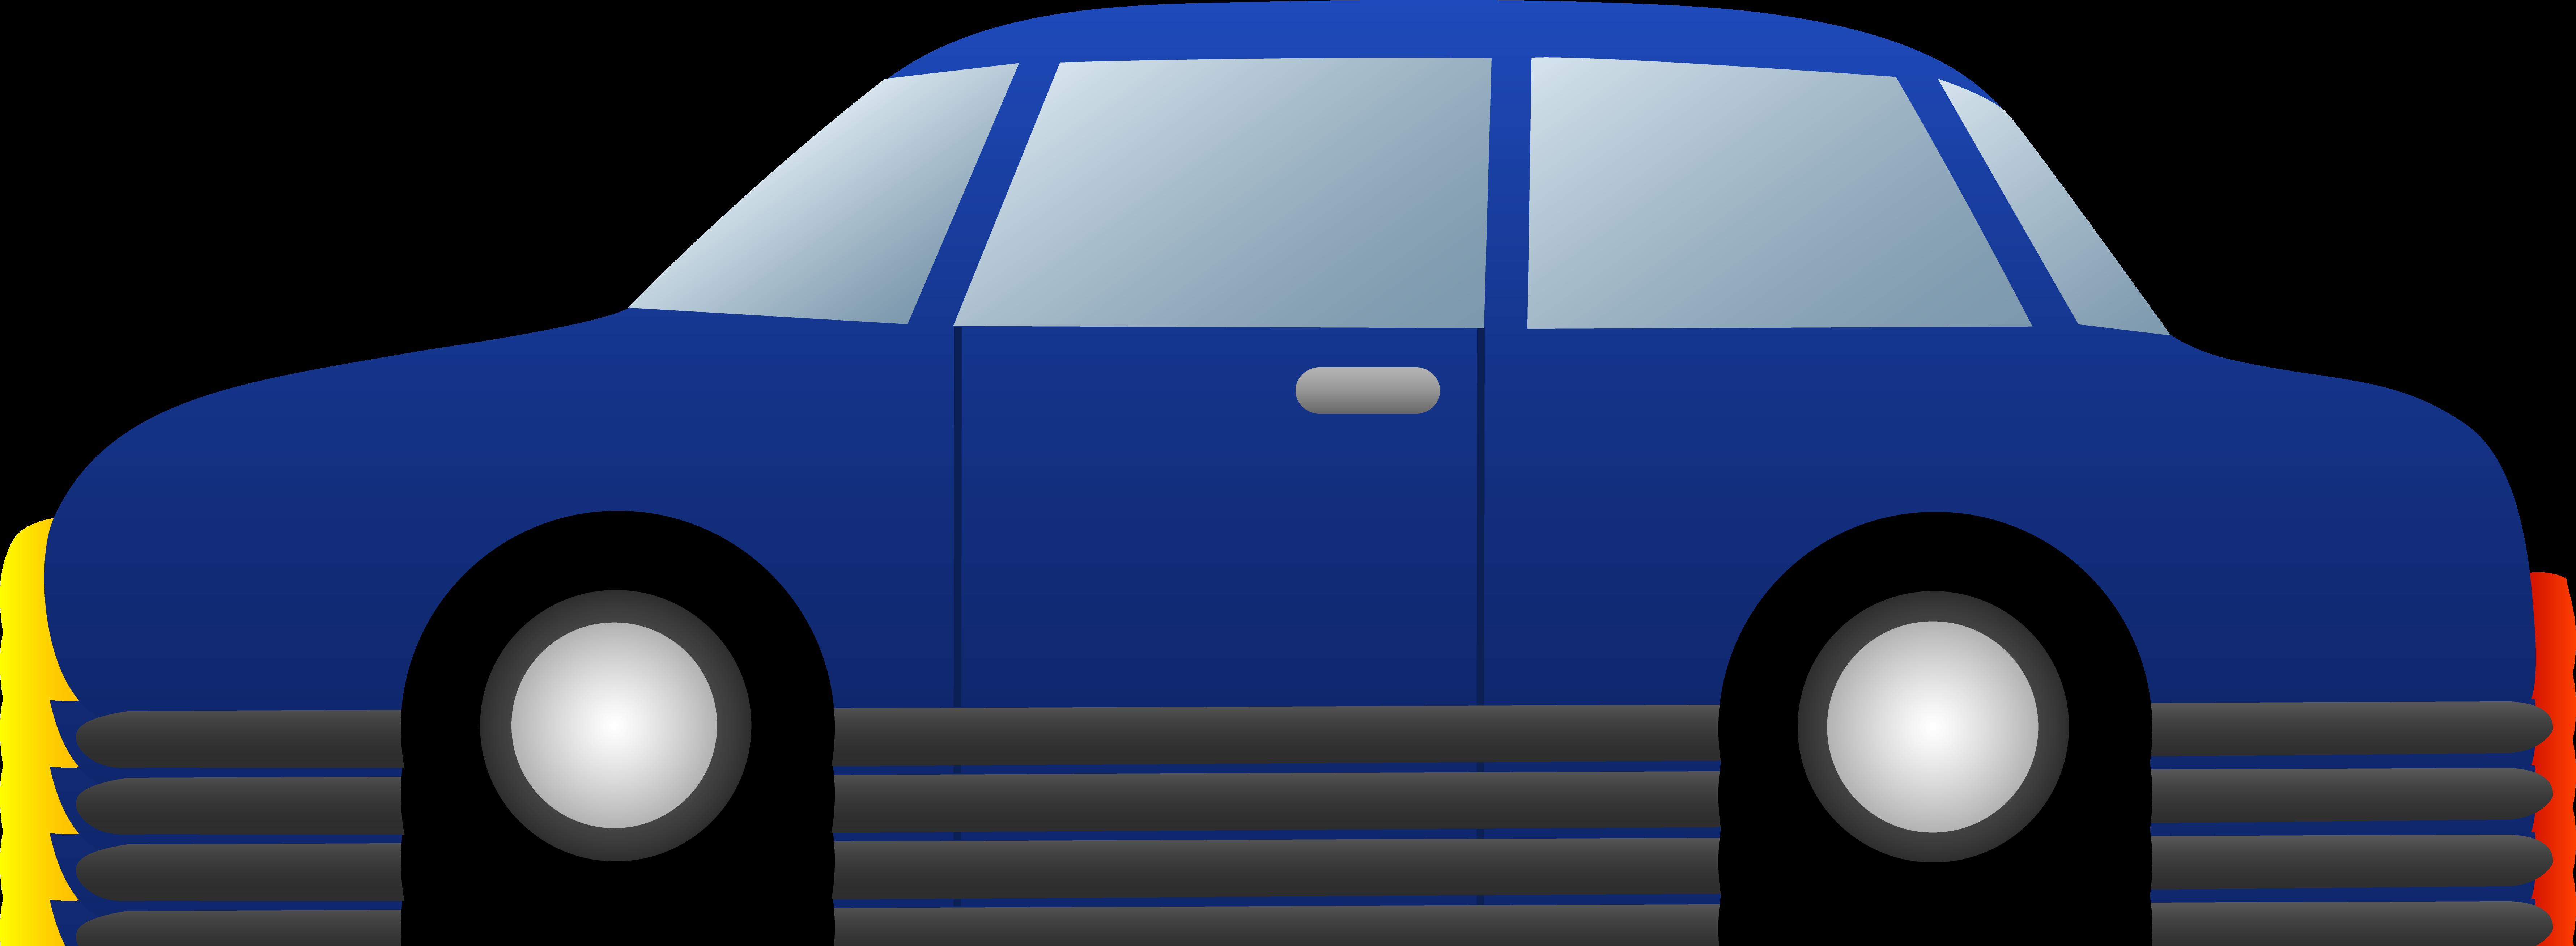 7122x2615 Vehicle Clip Art Free Clipart Panda